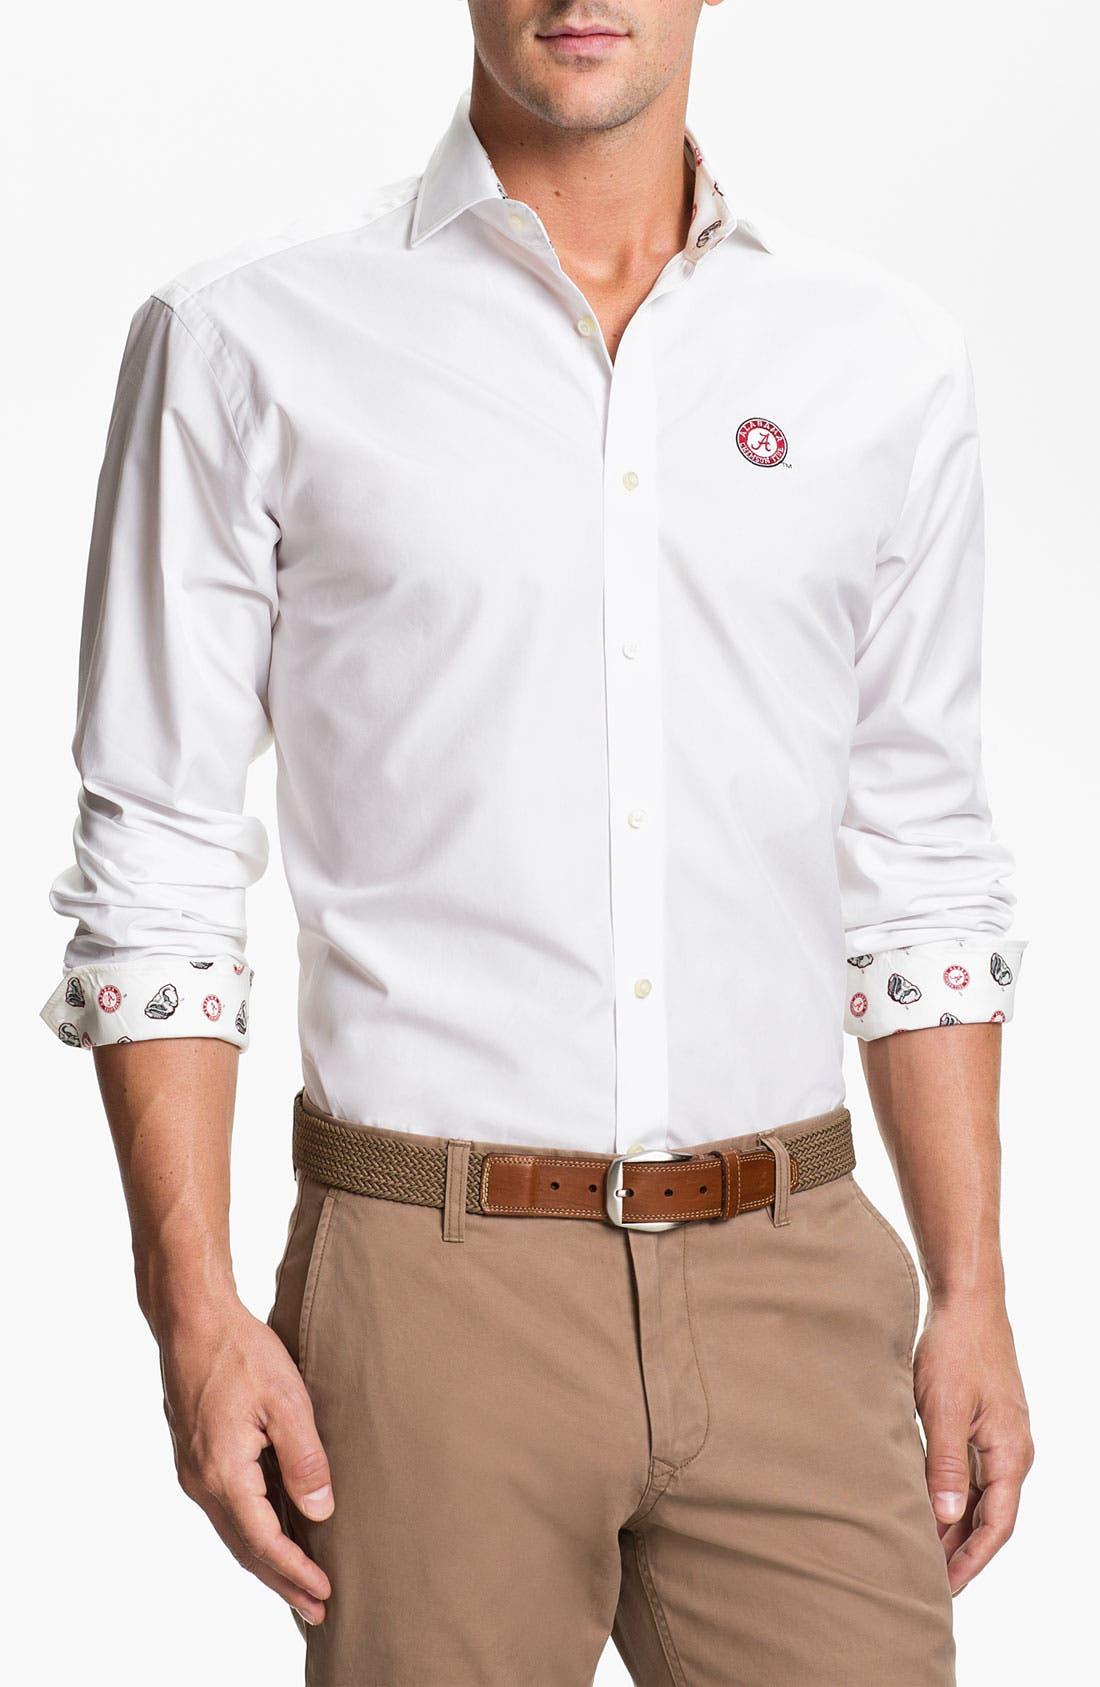 Alternate Image 1 Selected - Thomas Dean 'University of Alabama' Regular Fit Sport Shirt